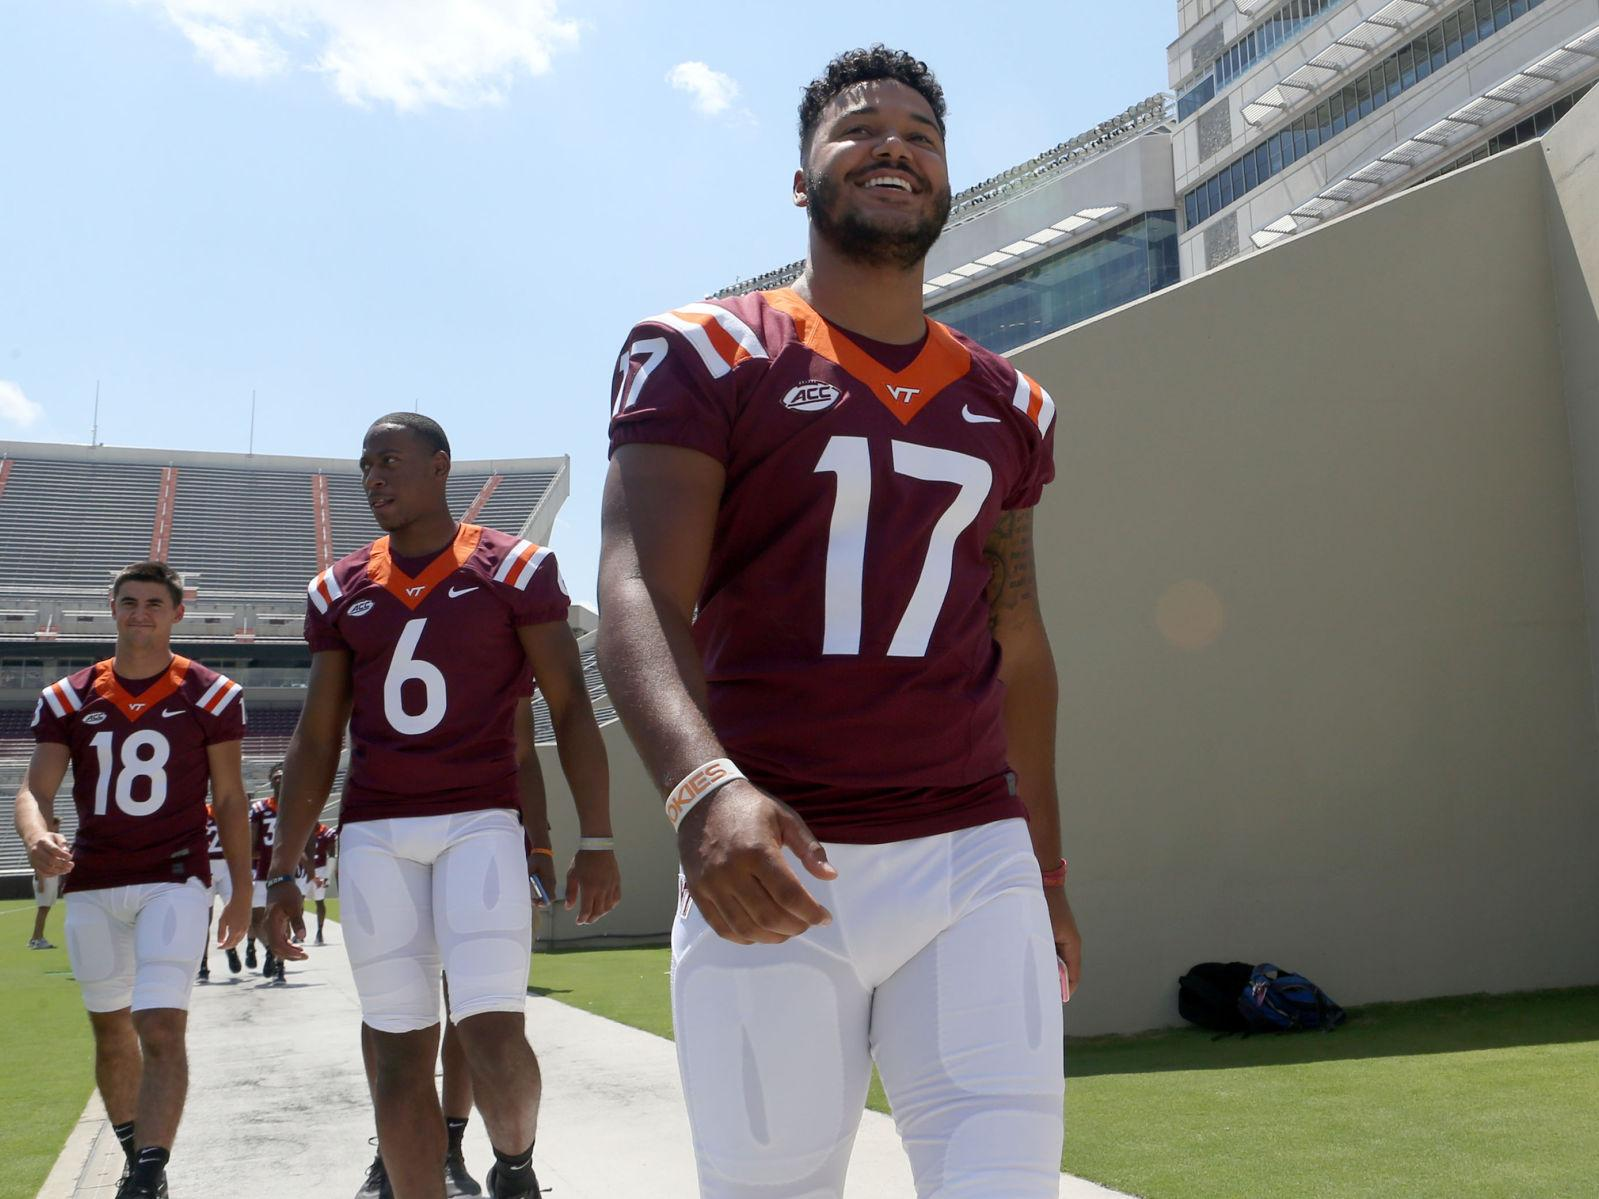 Virginia Tech Releases Depth Chart For Week 1 Matchup Against West Virginia Virginia Tech Roanoke Com